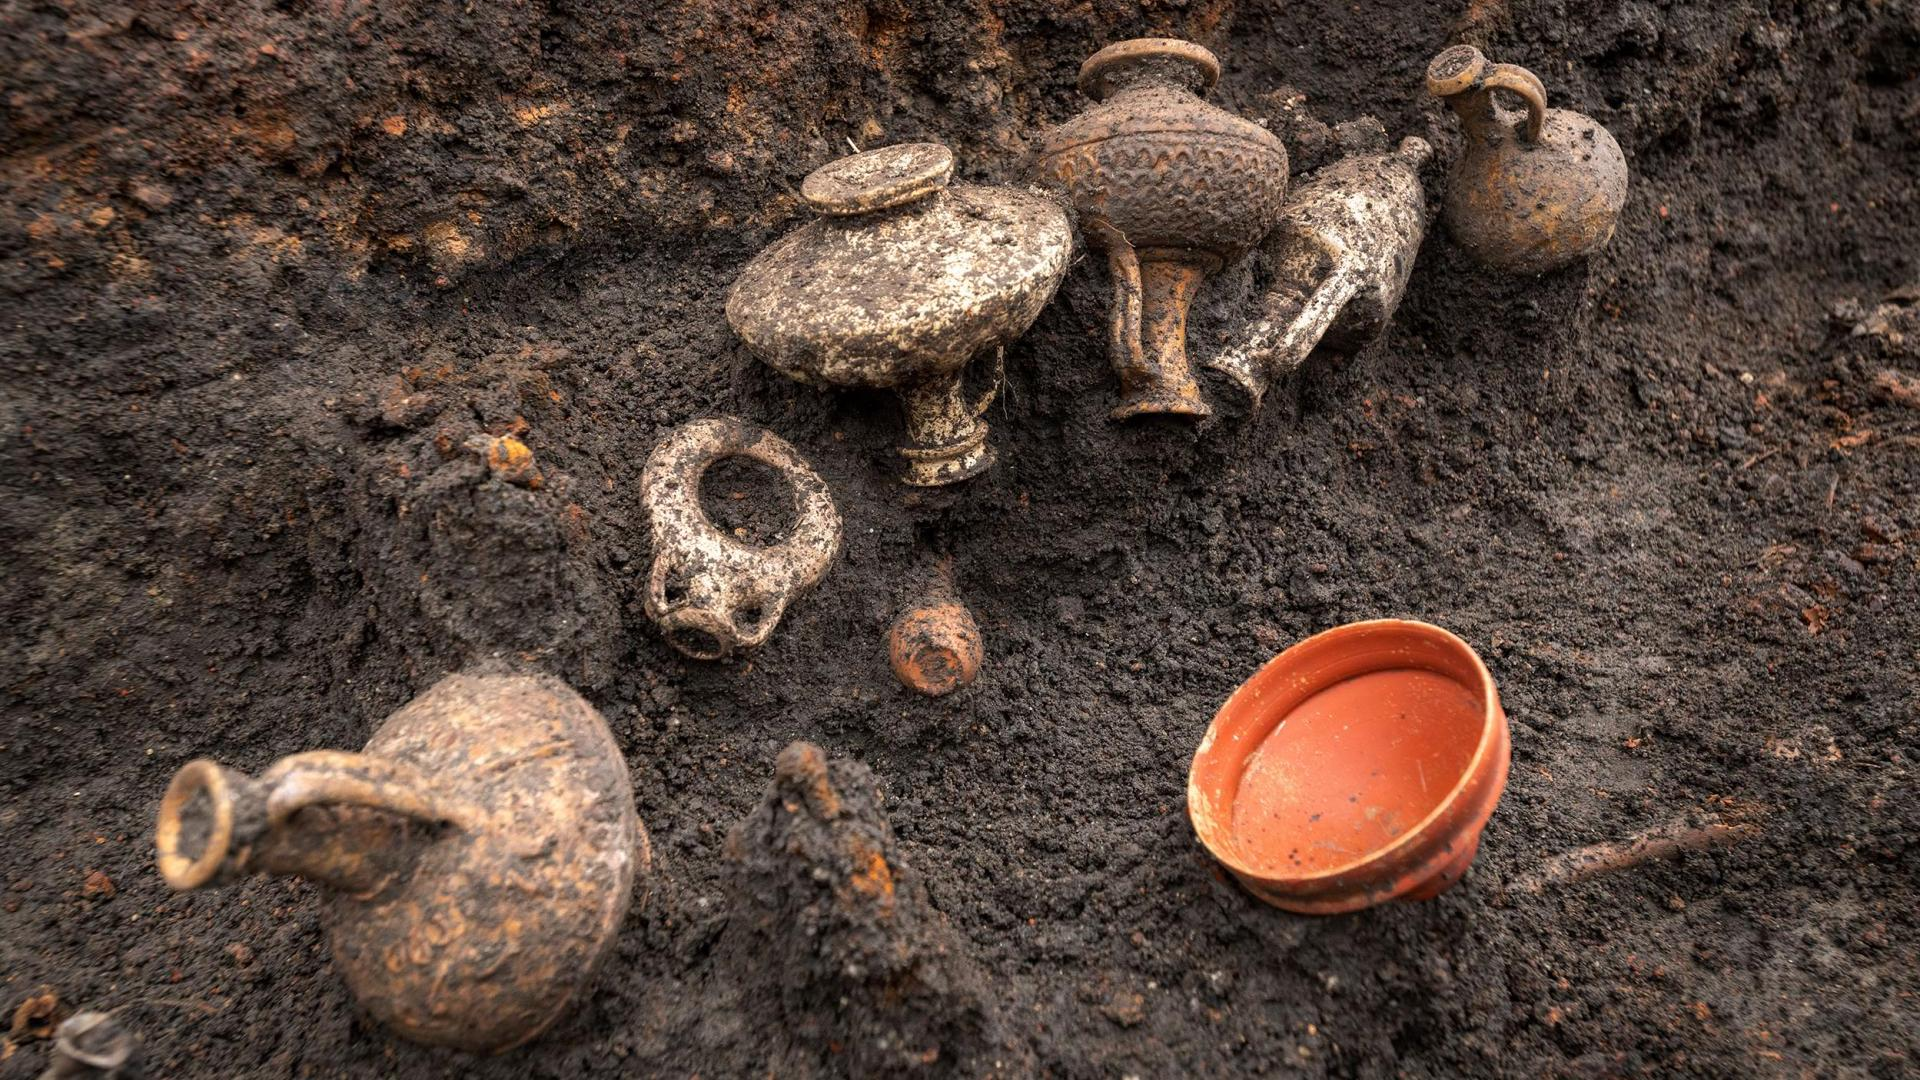 L'inhumation remonte à environ 2000 ans.